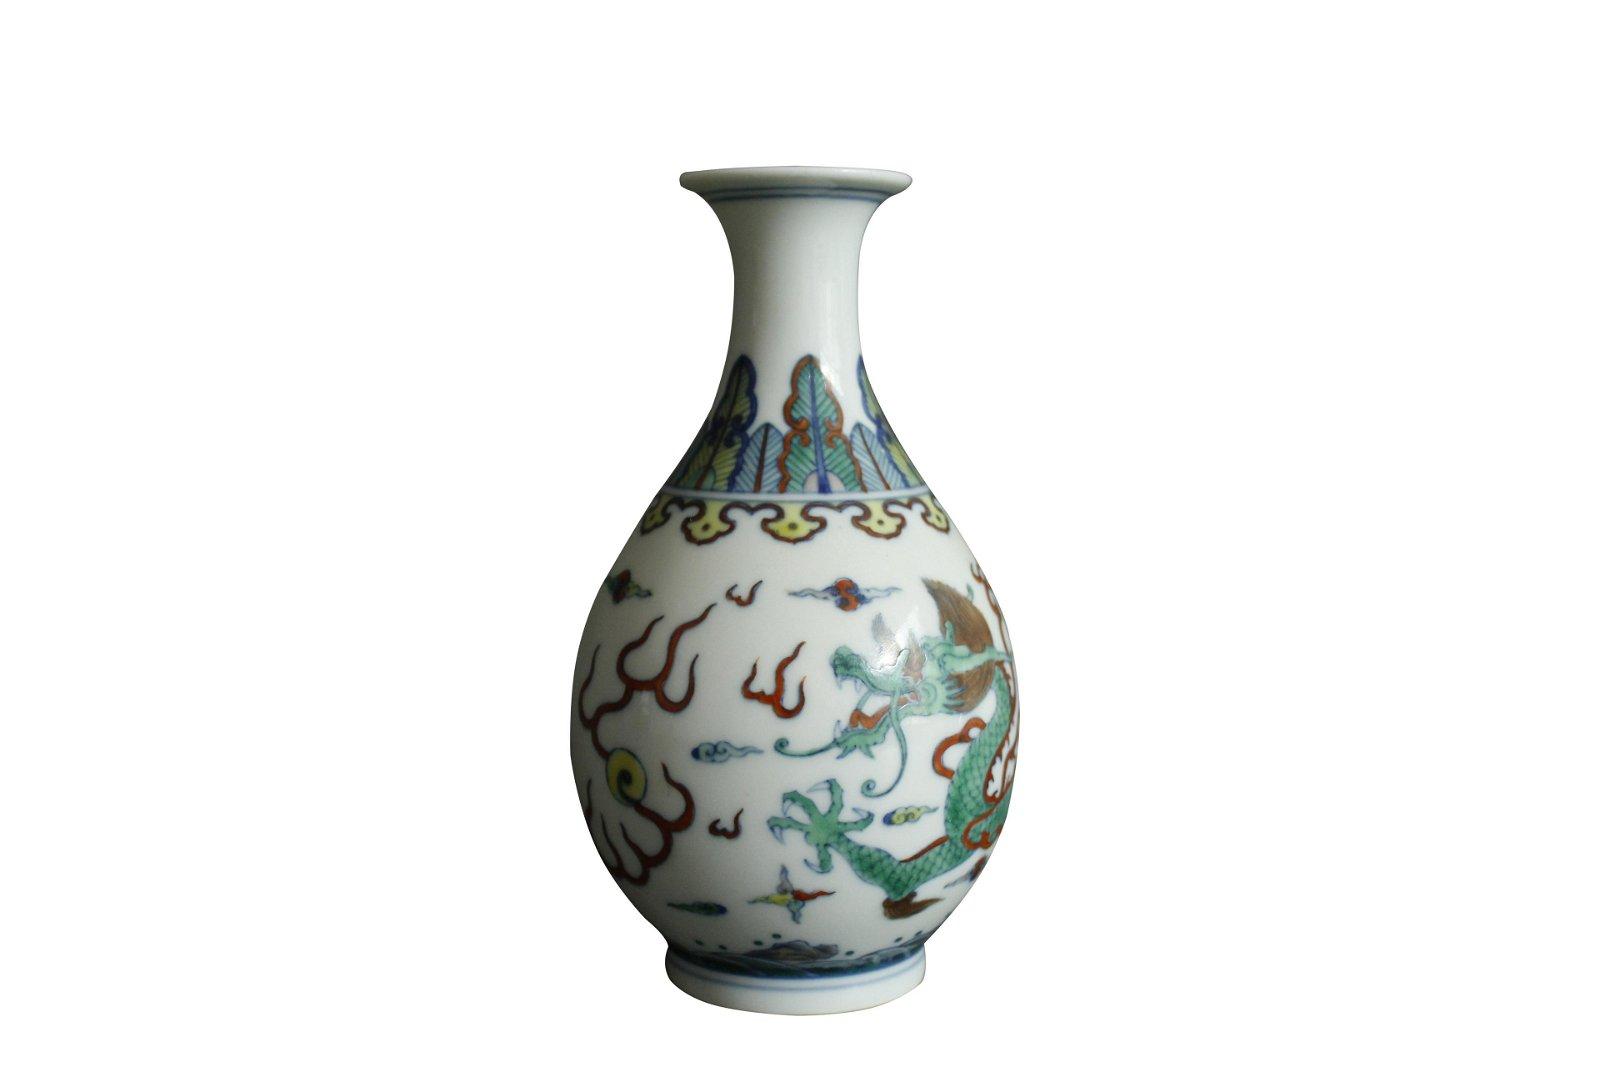 A Chinese Dou-Cai Porcelain Vase